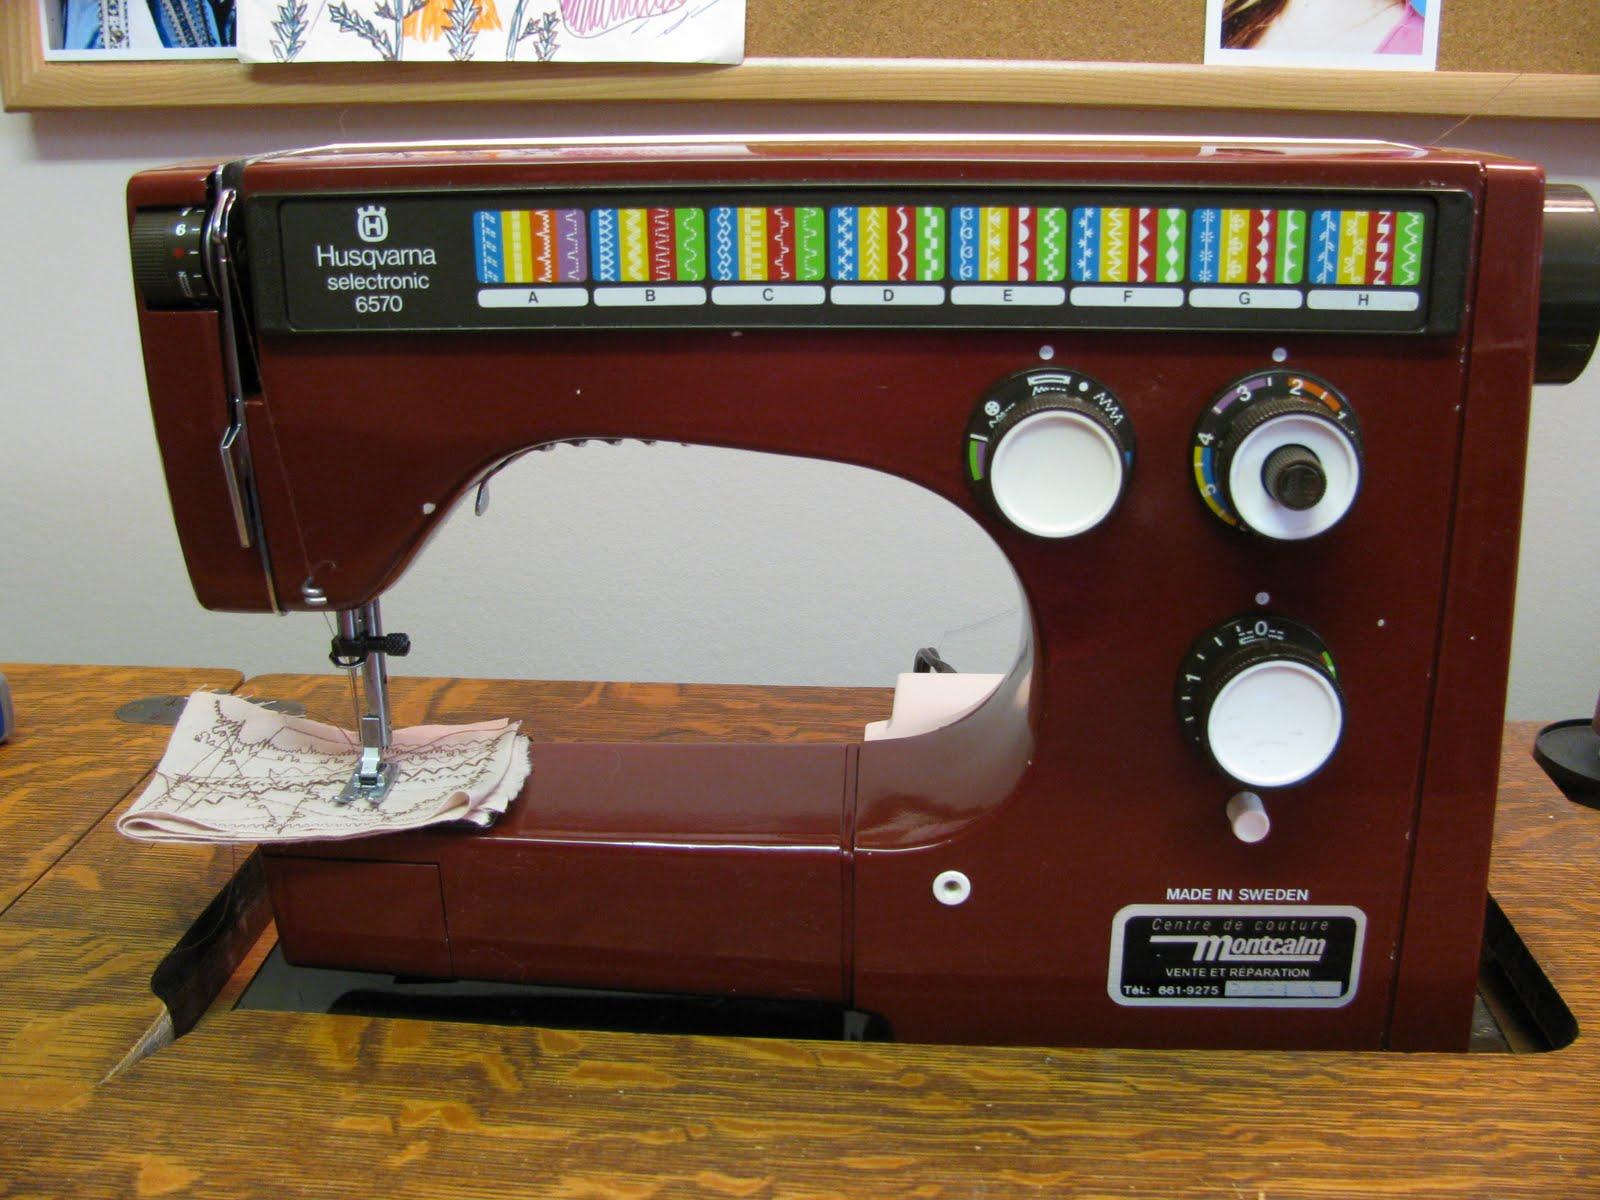 1979 Husqvarna 6570 (Ruby)